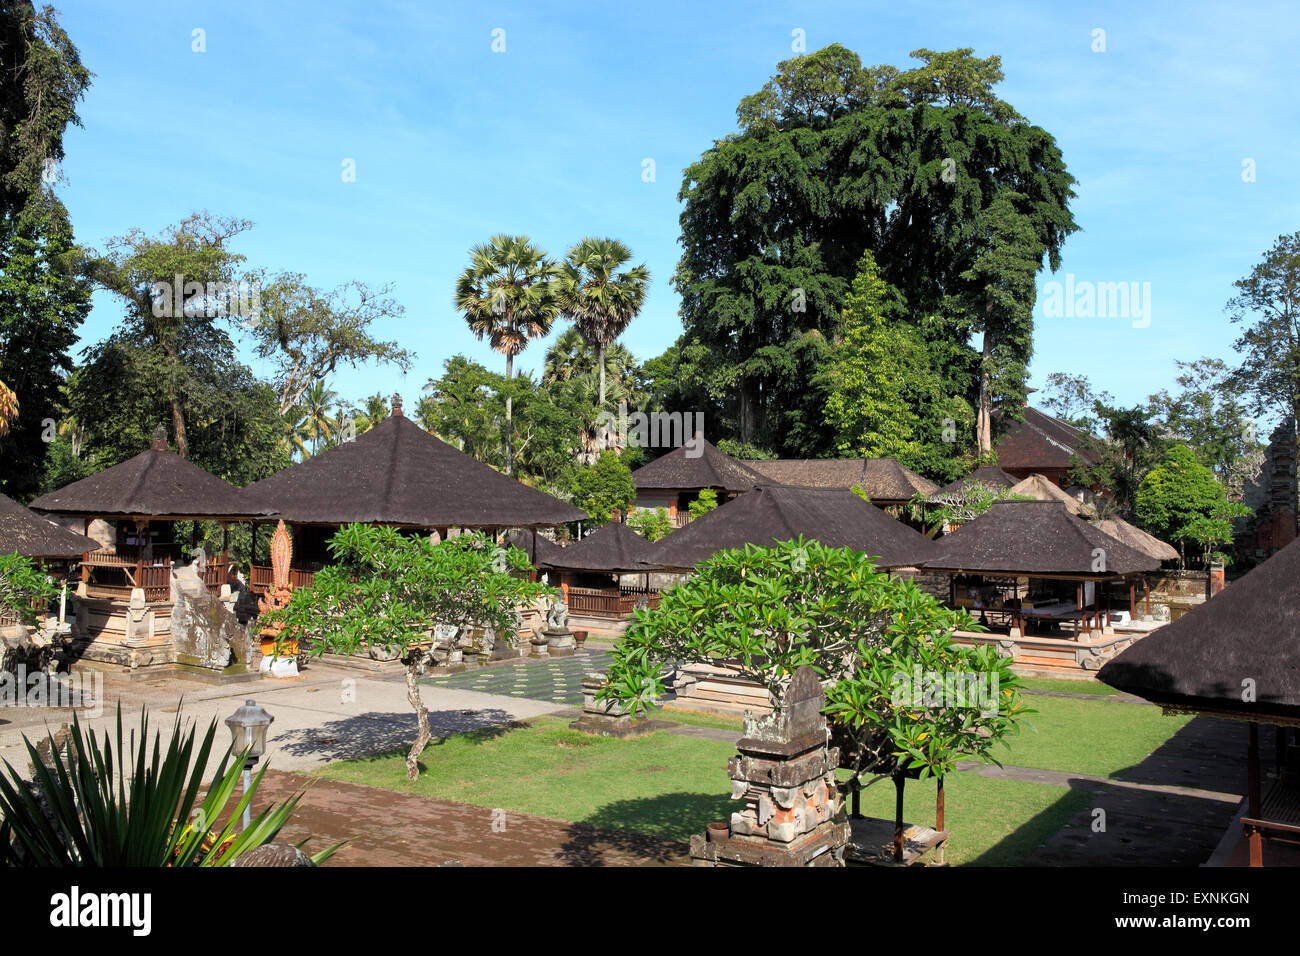 Pura Samuan Tiga temple, Bedulu, Ubud, Bali, Indonesia - Stock Image